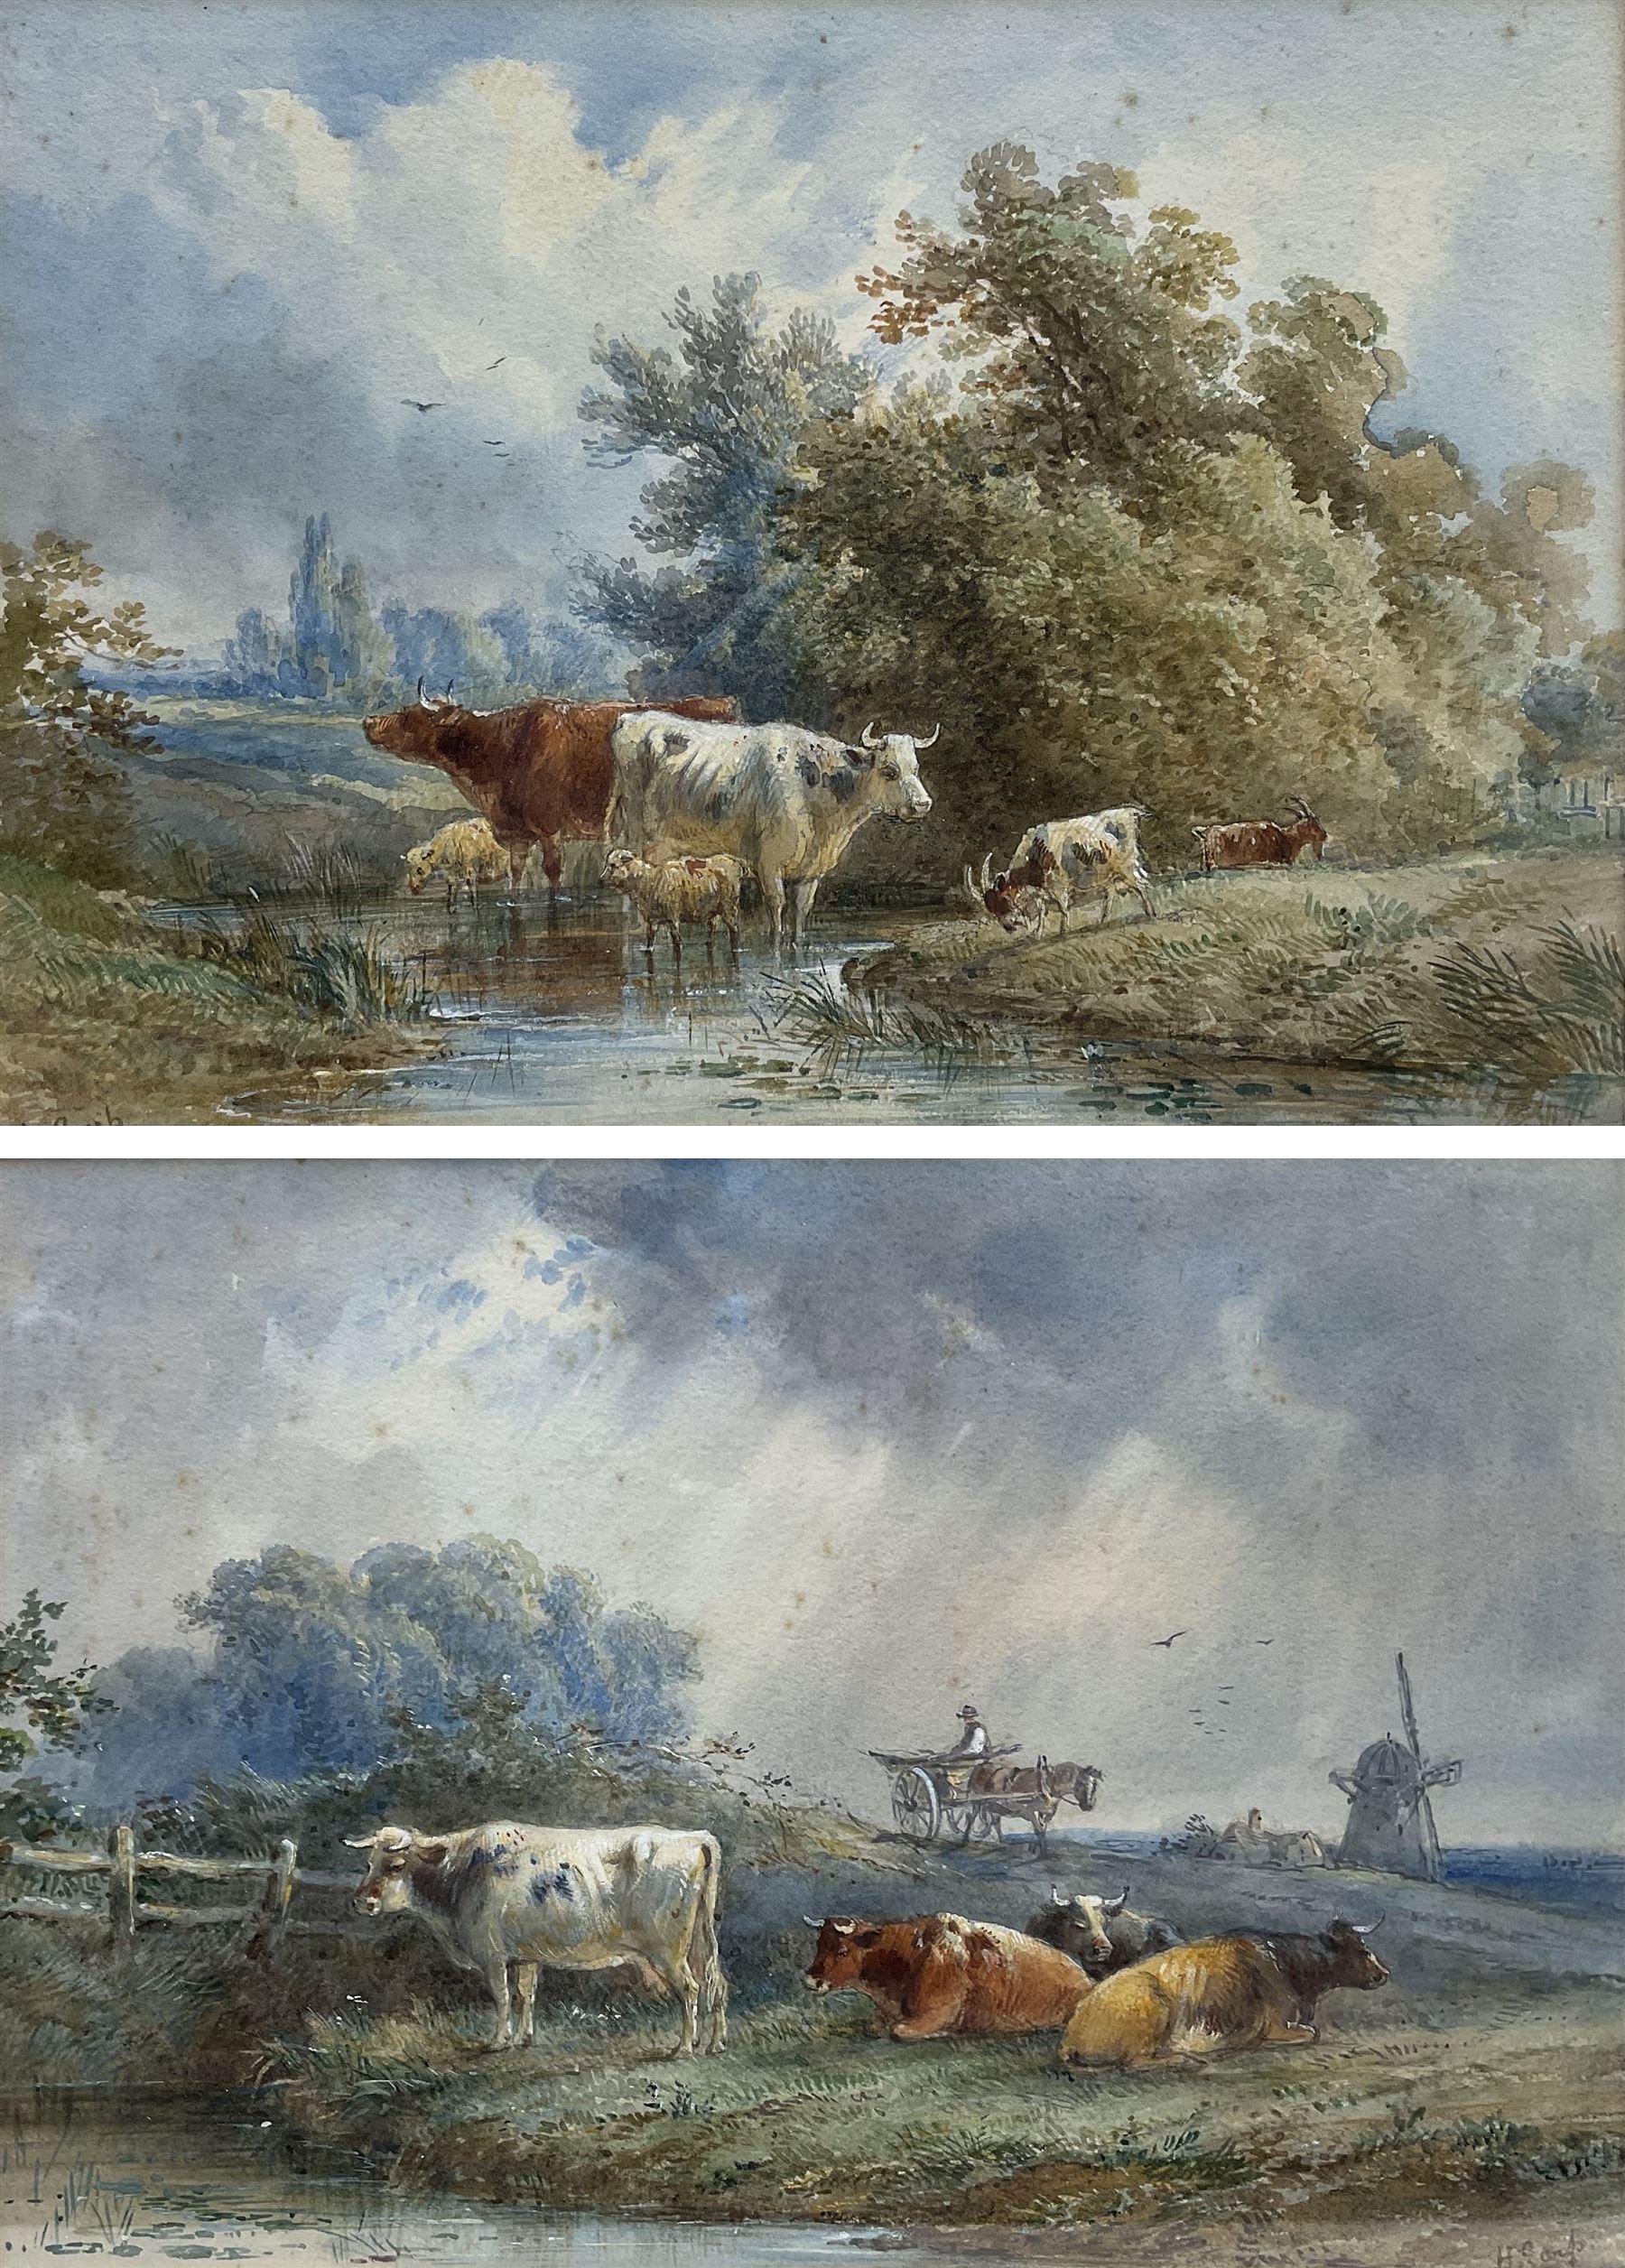 Henry Earp (British 1831-1914): Cattle Watering